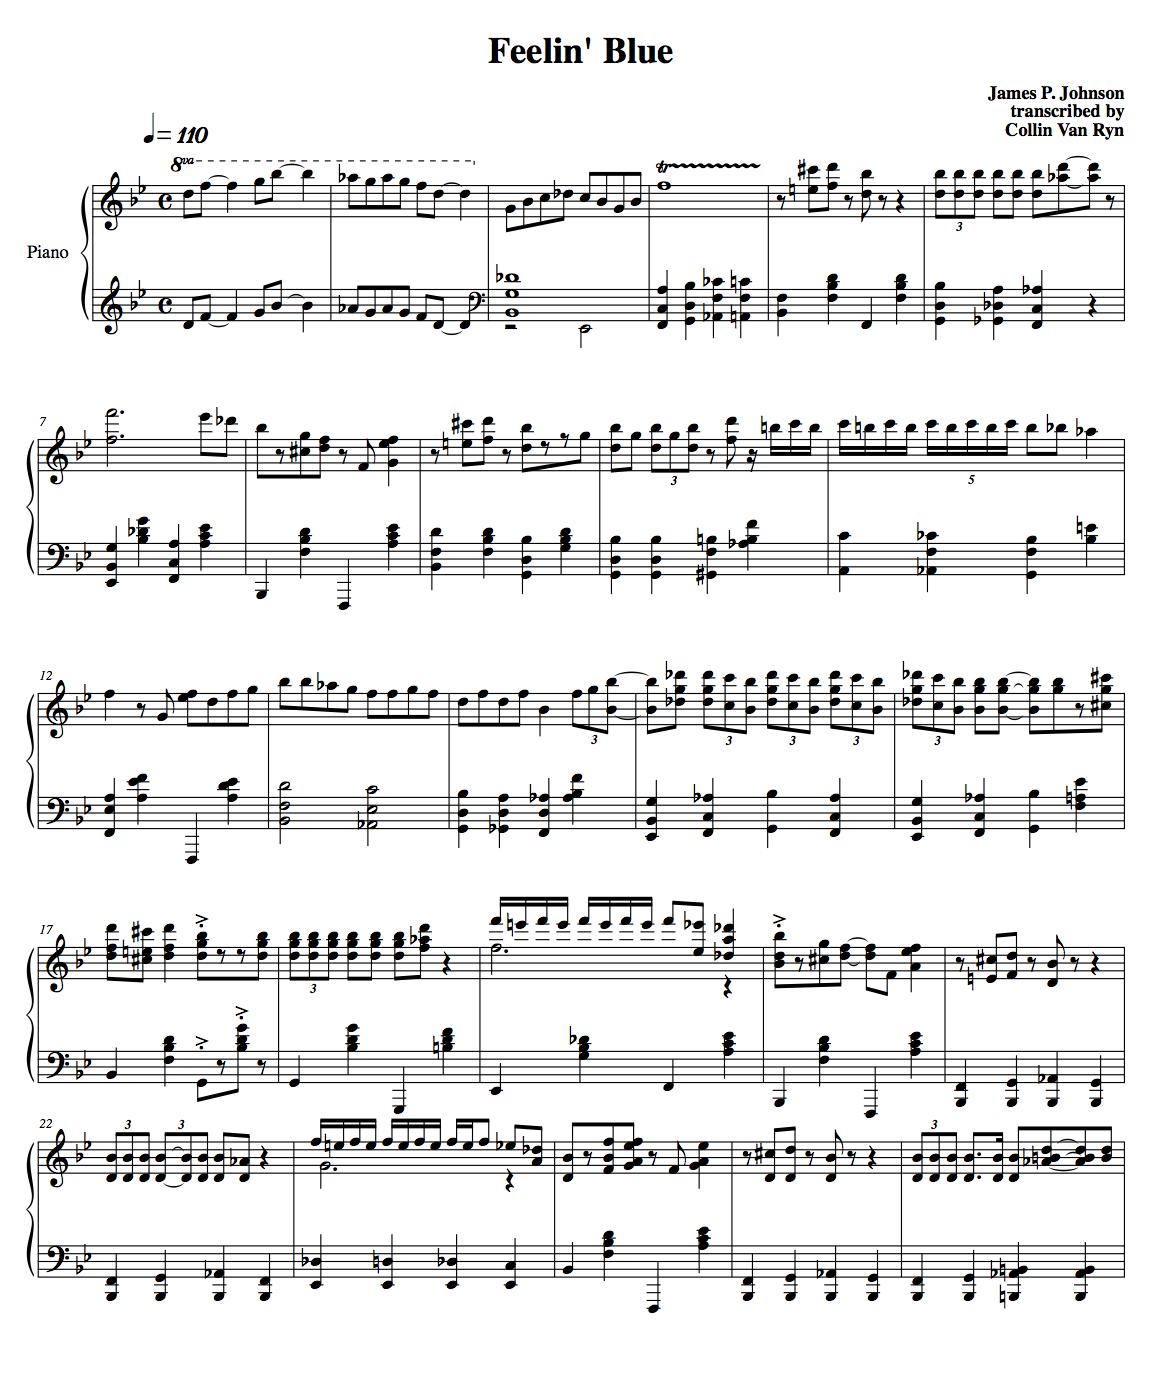 Learning Blues Piano From Music Score: Slow Blues Piano Sheet Music Pdf